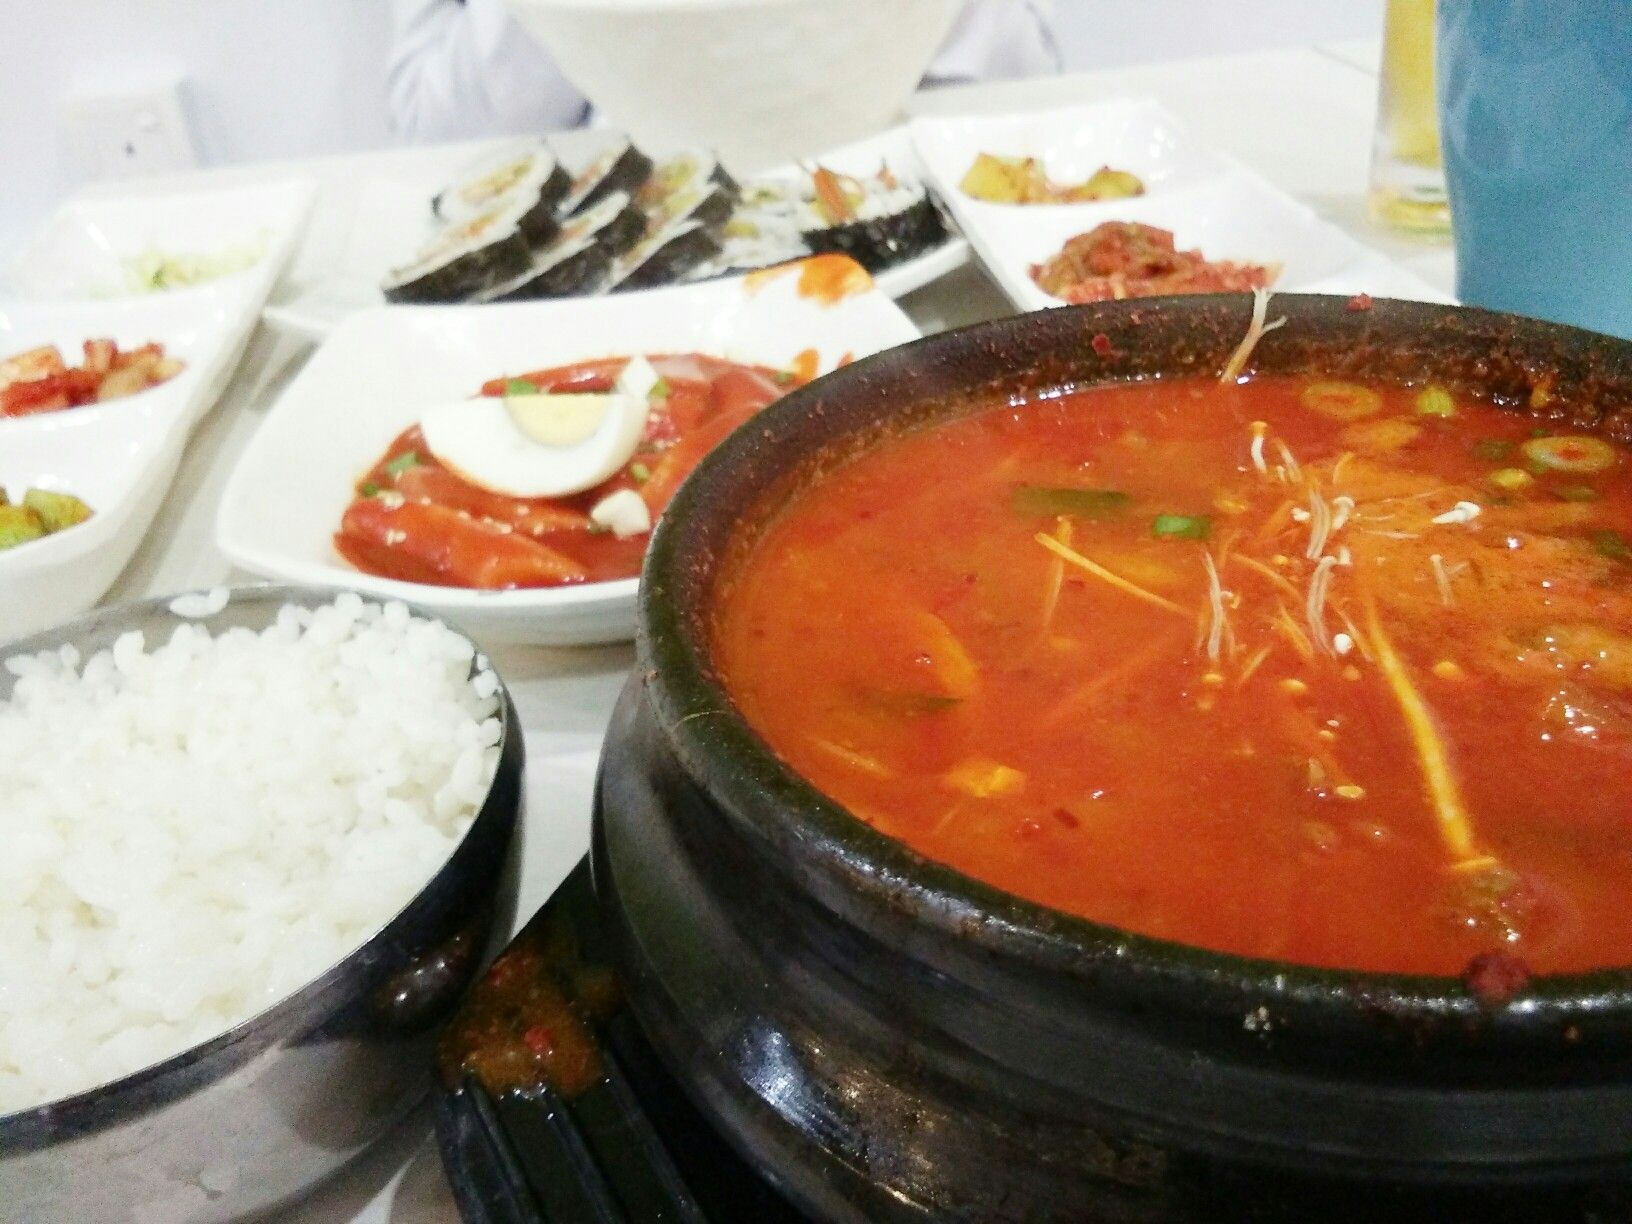 Korean Foods Sopong Tamanmelawatimall Kuala Lumpur Malaysia With My Little Sister Food Korean Food Love Eat